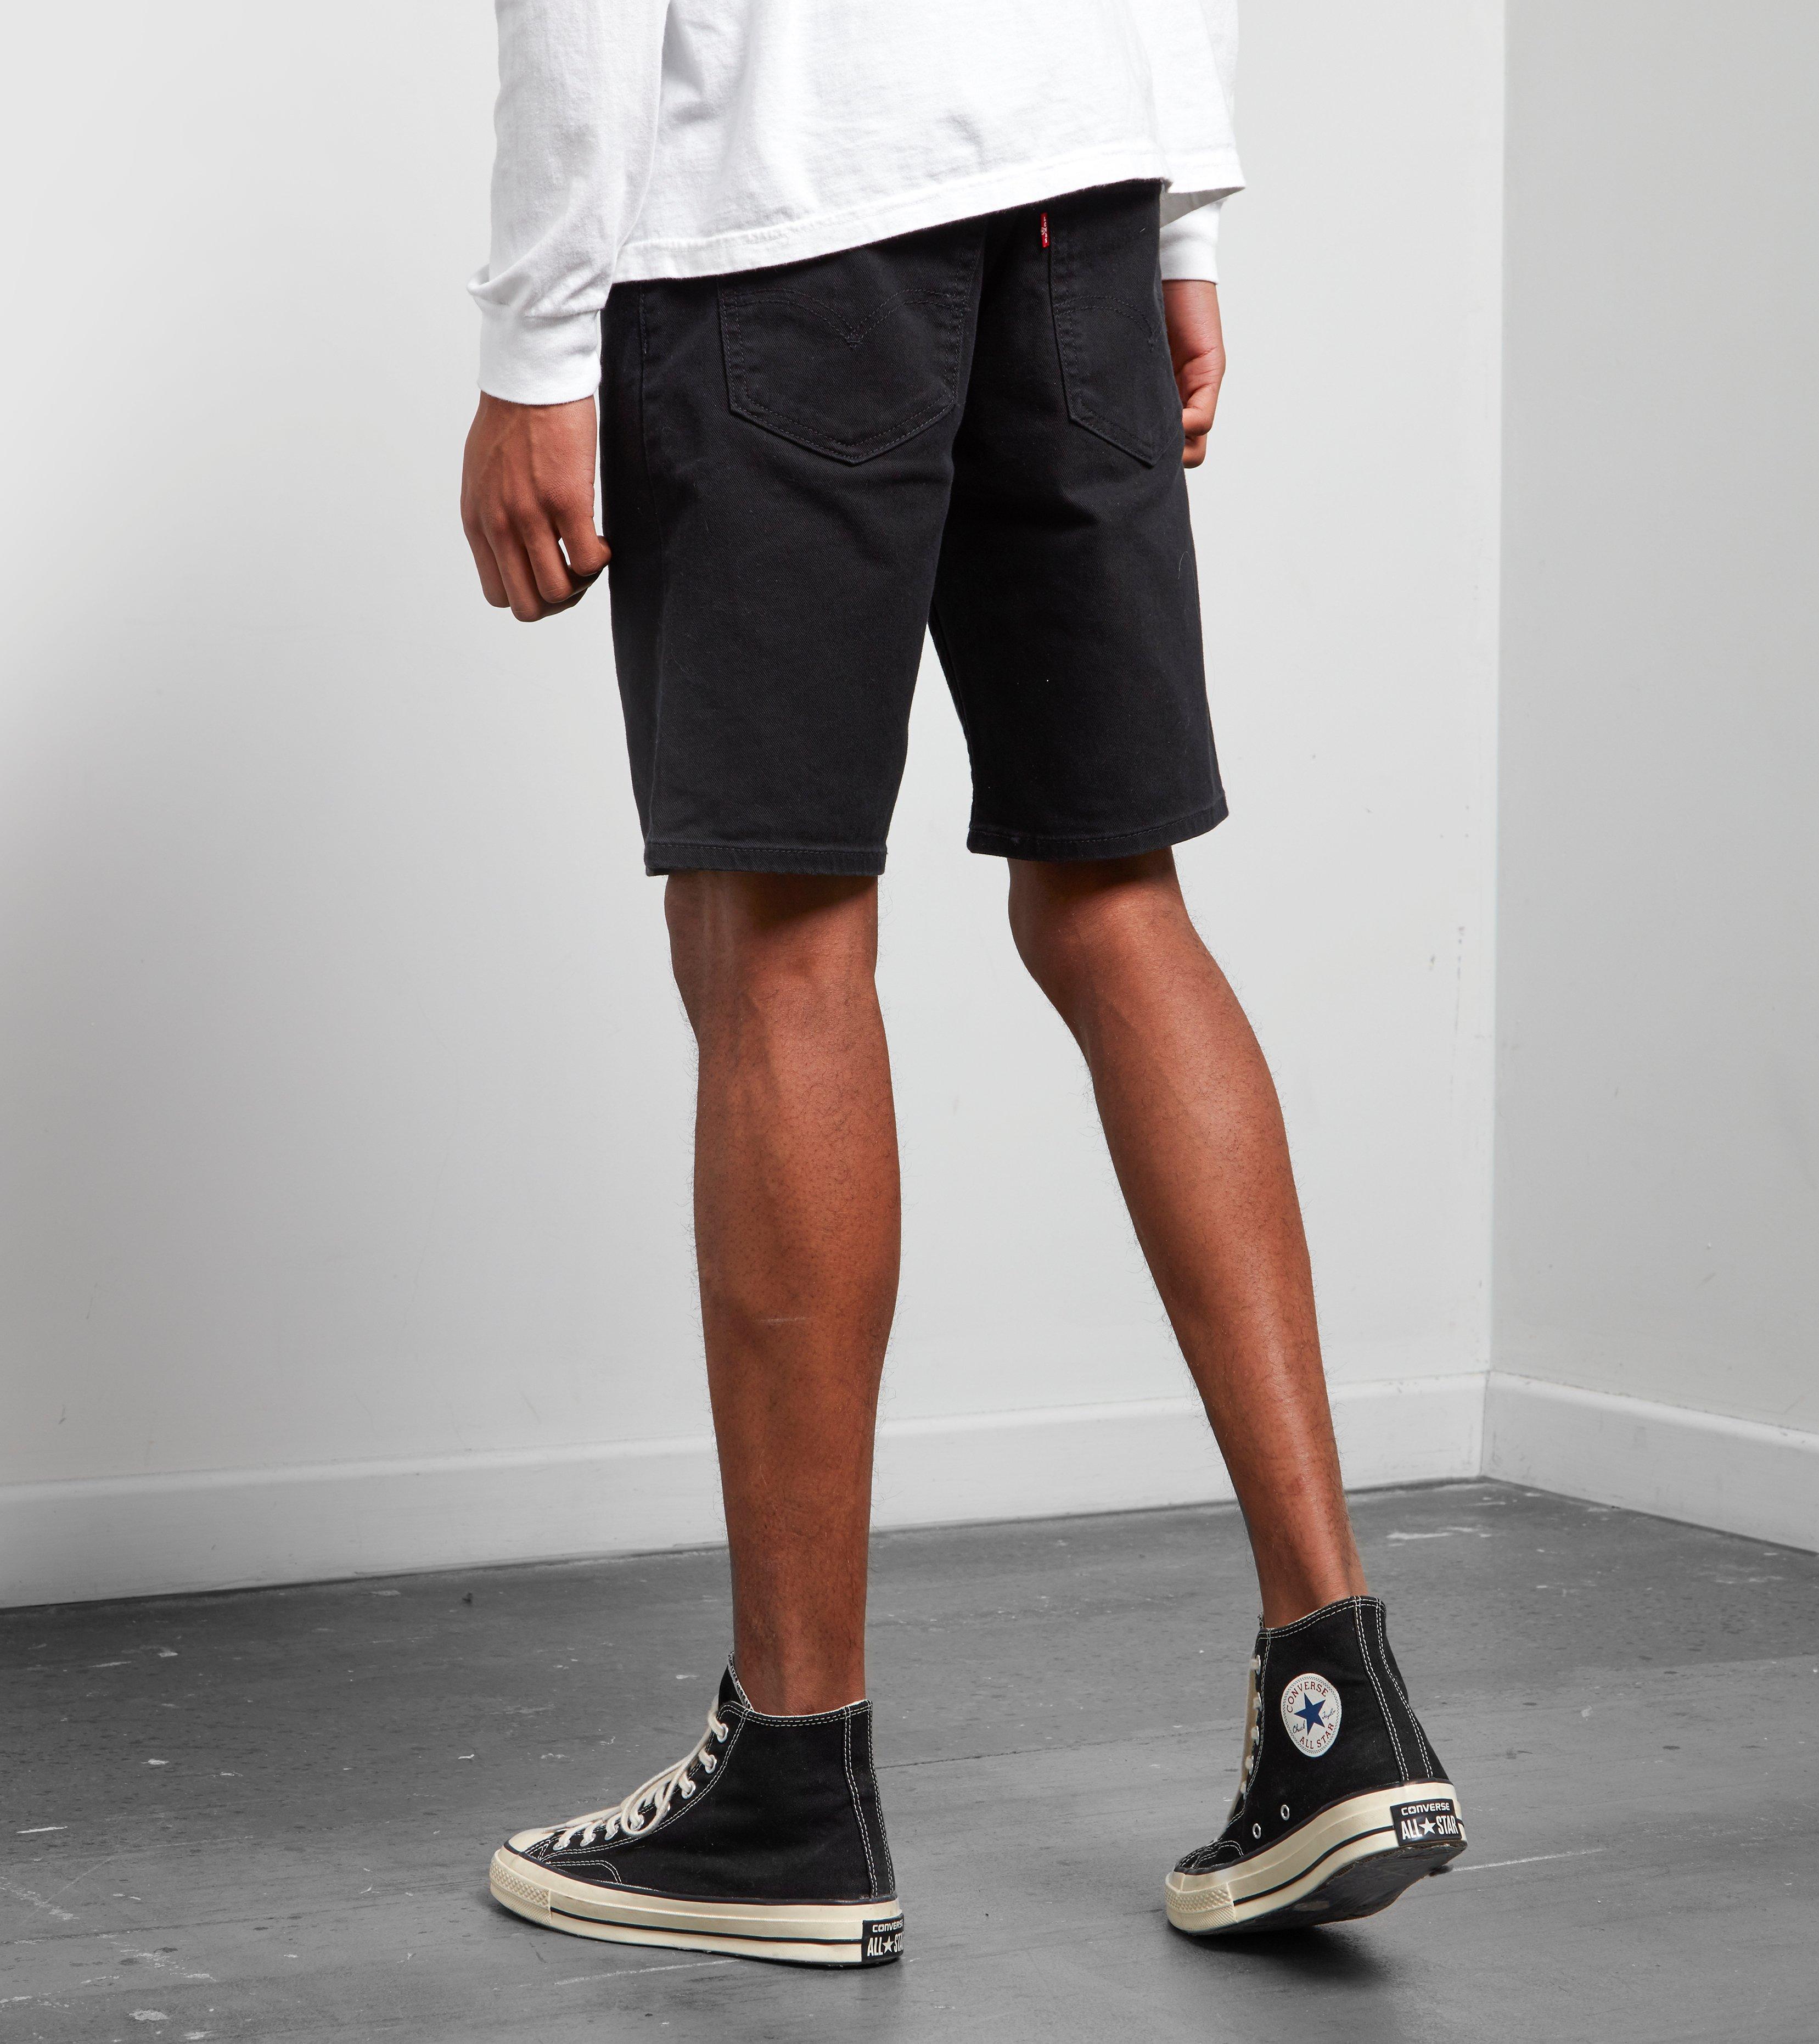 c519bbdb Levi's Levis 502 Regular Taper Fit Hemmed Shorts in Black for Men - Lyst